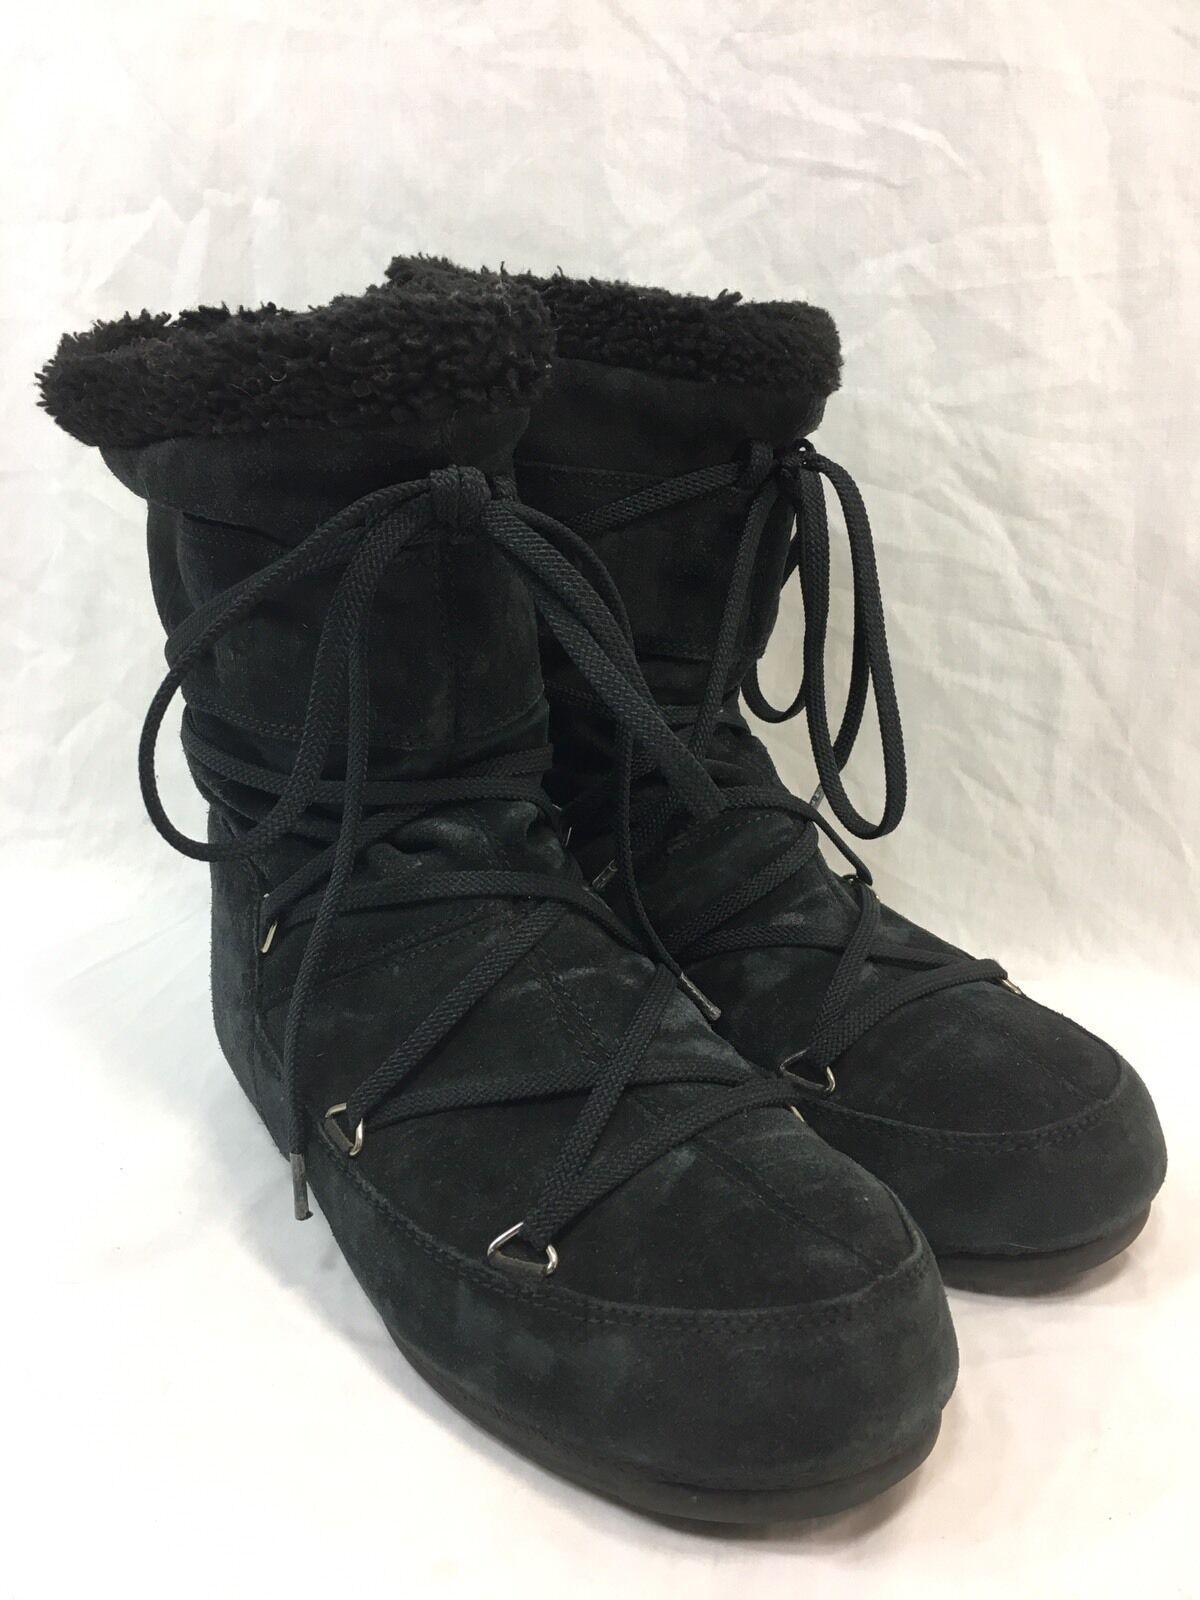 Tecnica Moon Stiefel Fashion Winter BLACK Suede Damenschuhe Größe 6.5 Pull-On Laces EUC